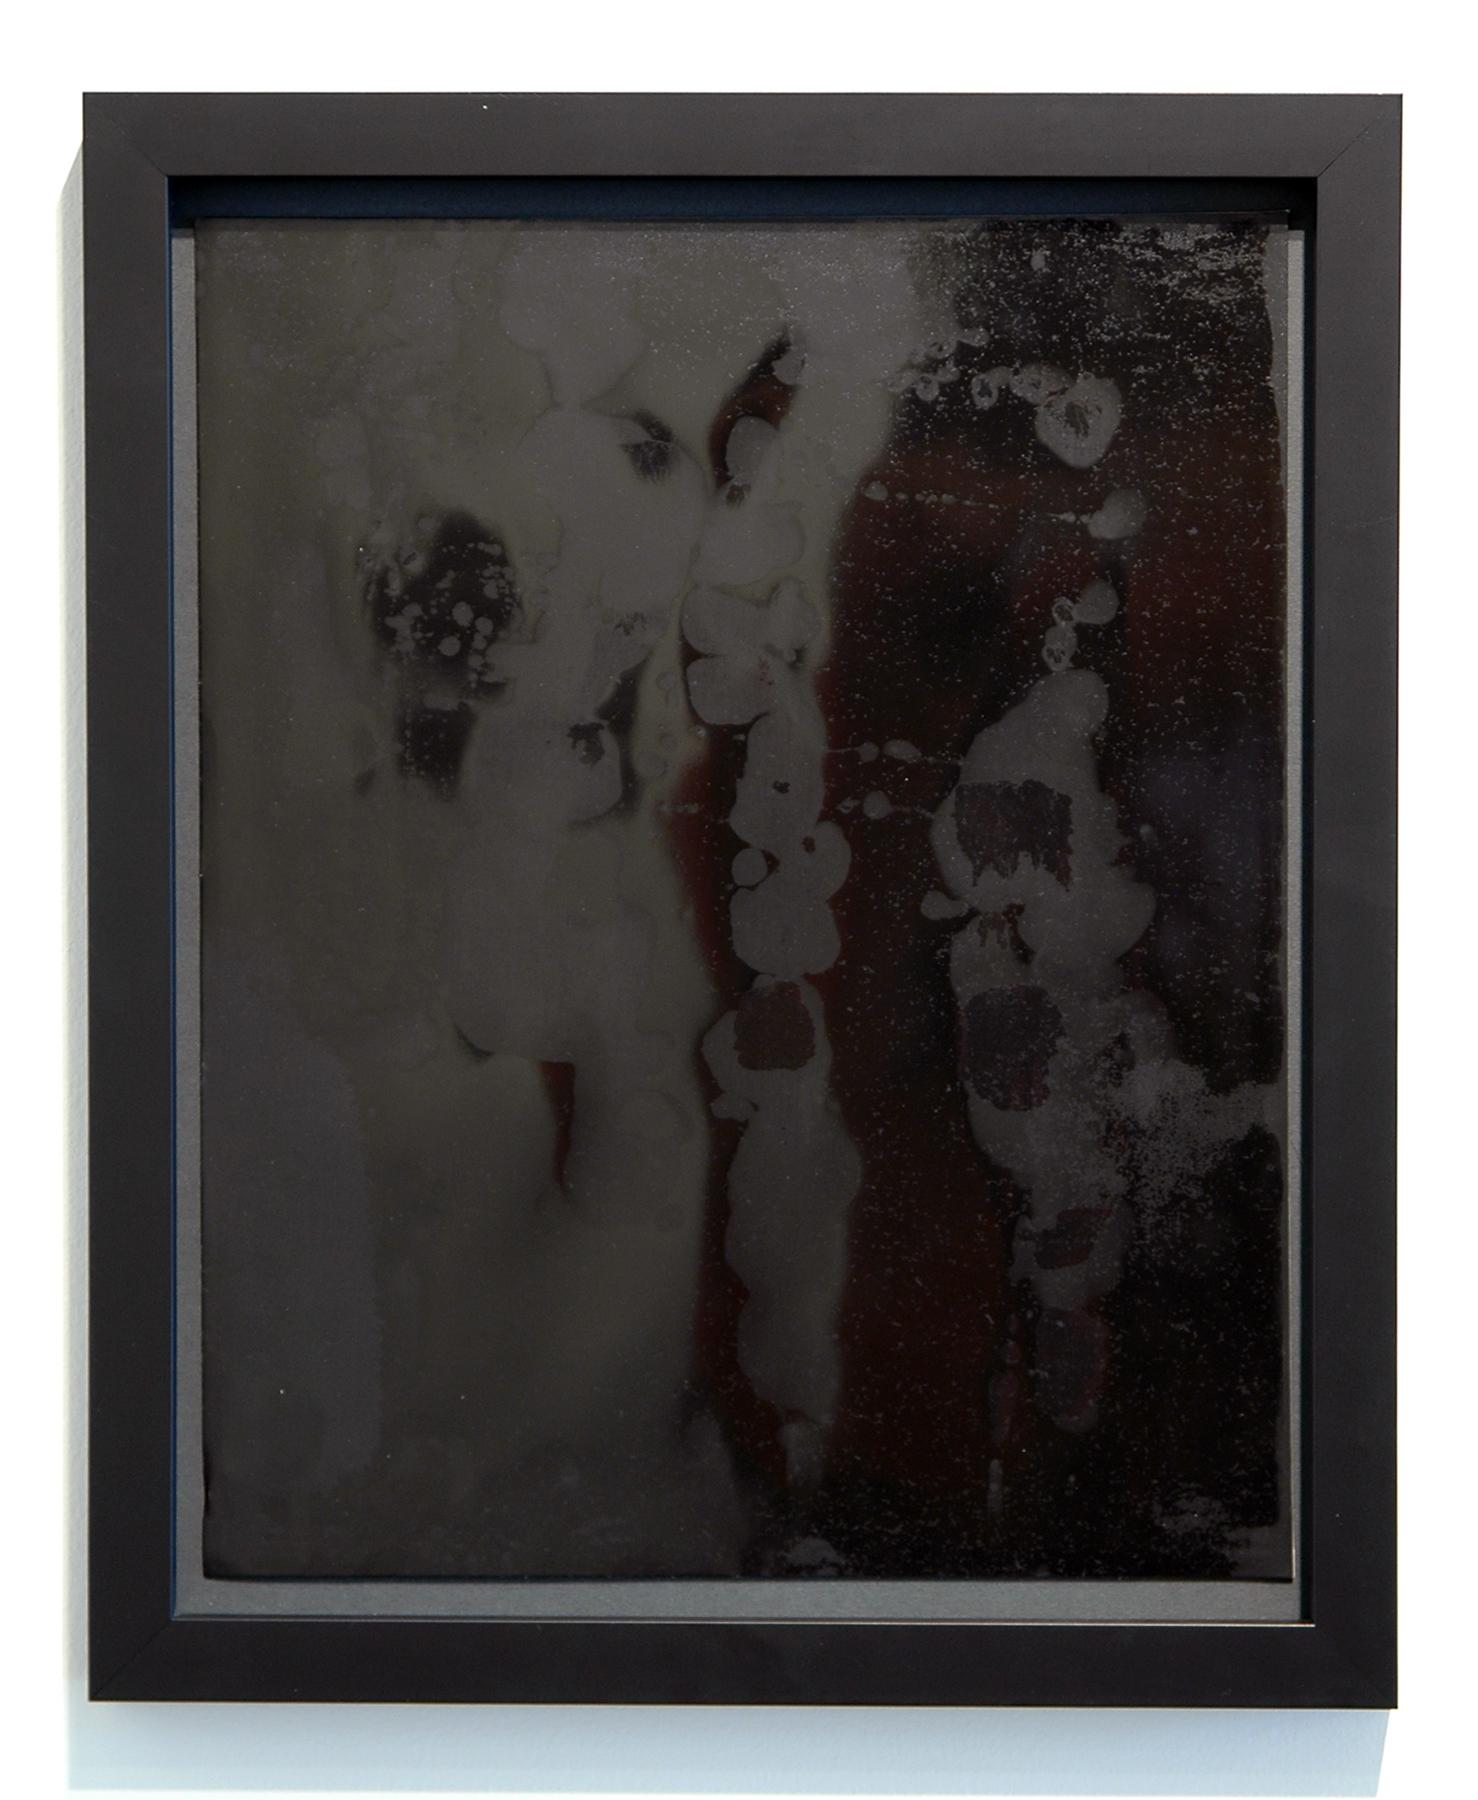 "WITH CINDER BLOCKS WE FLATTEN OUR PHOTOGRAPHS  C. Wright Daniel, Untitled (Burnished 3) , unique silver gelatin print, 16.25"" x 13.25"" (framed), 2013"